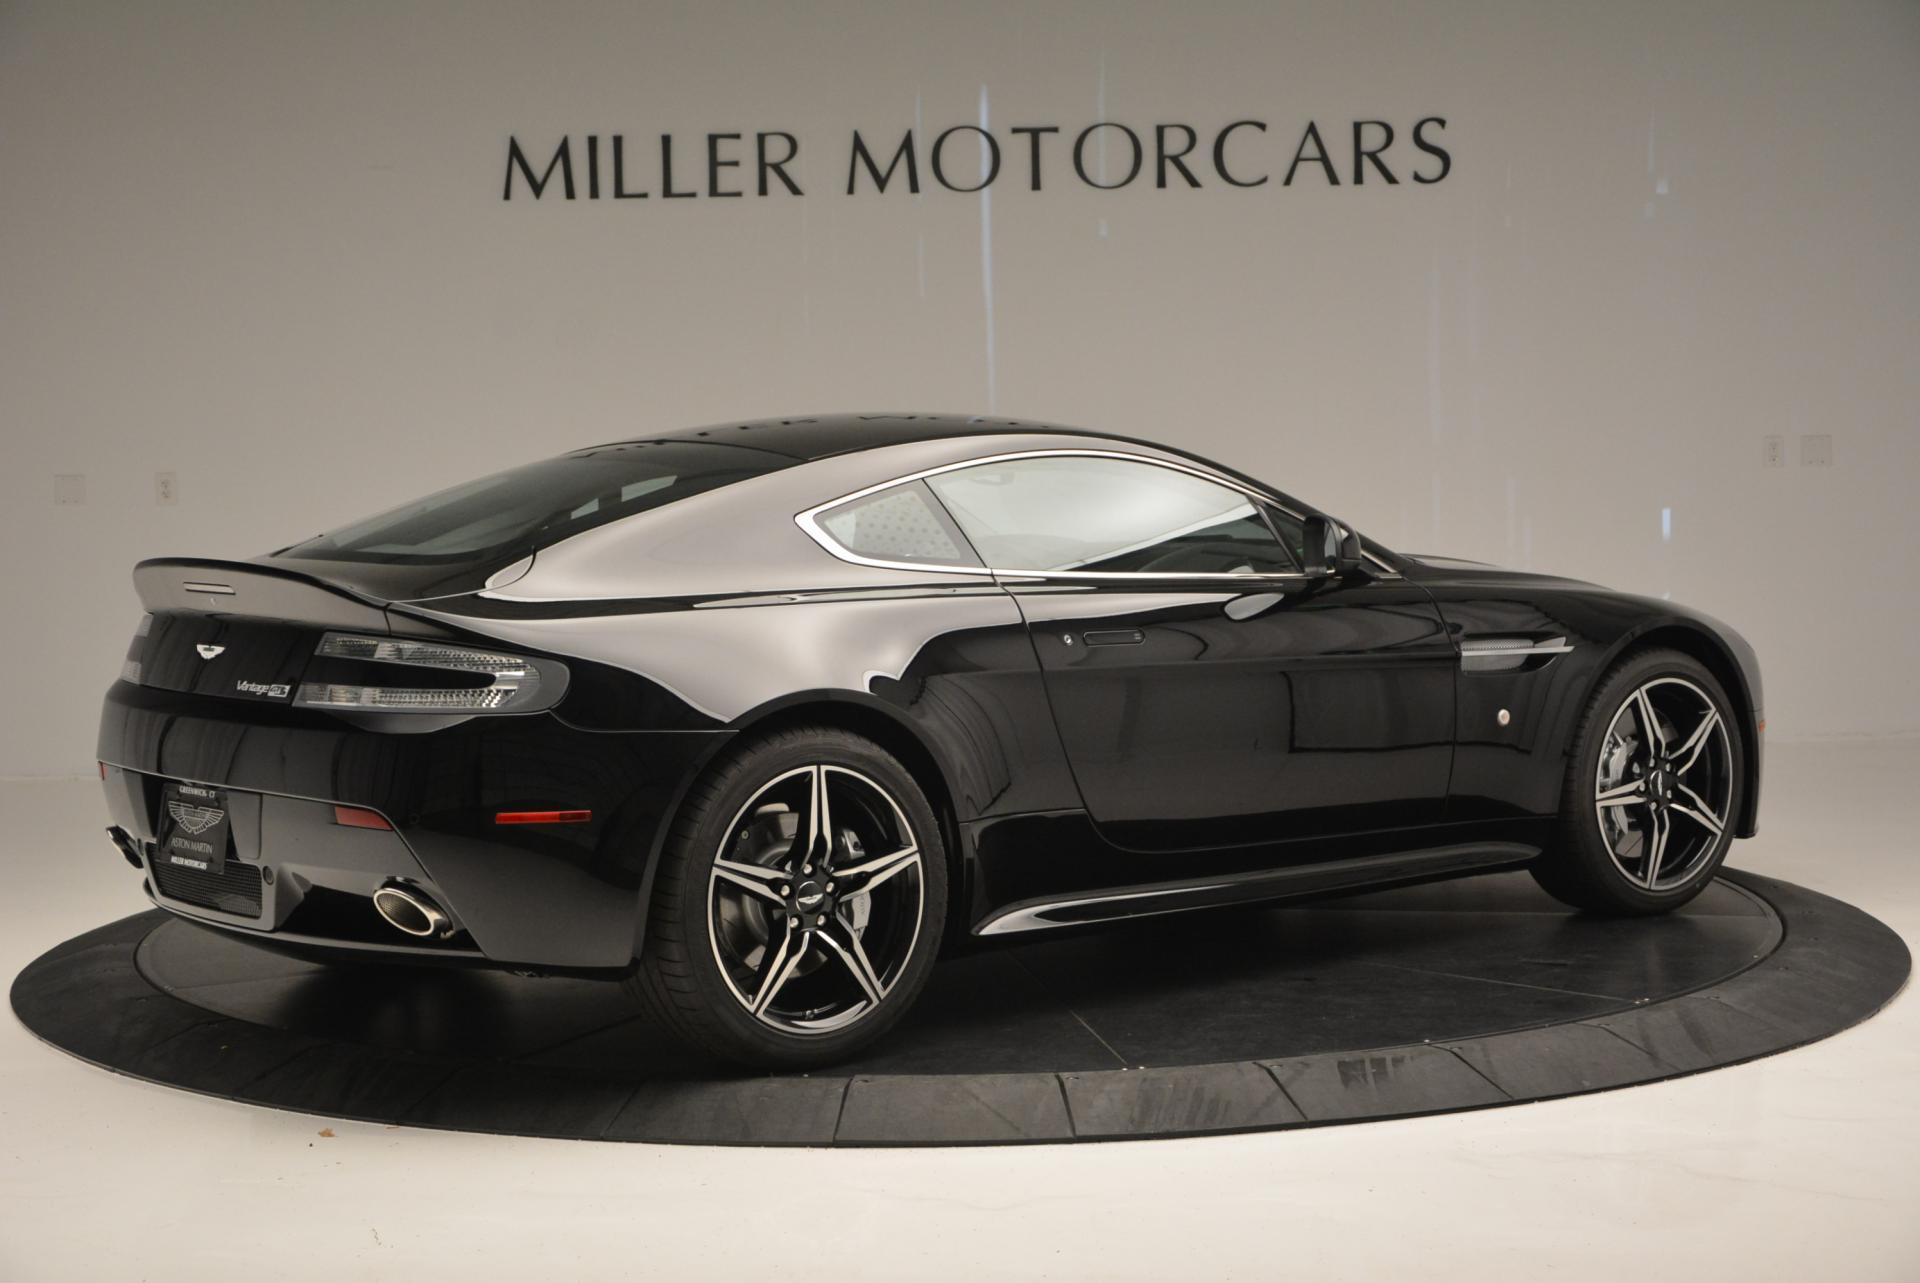 New 2016 Aston Martin V8 Vantage GTS S For Sale In Greenwich, CT 526_p7